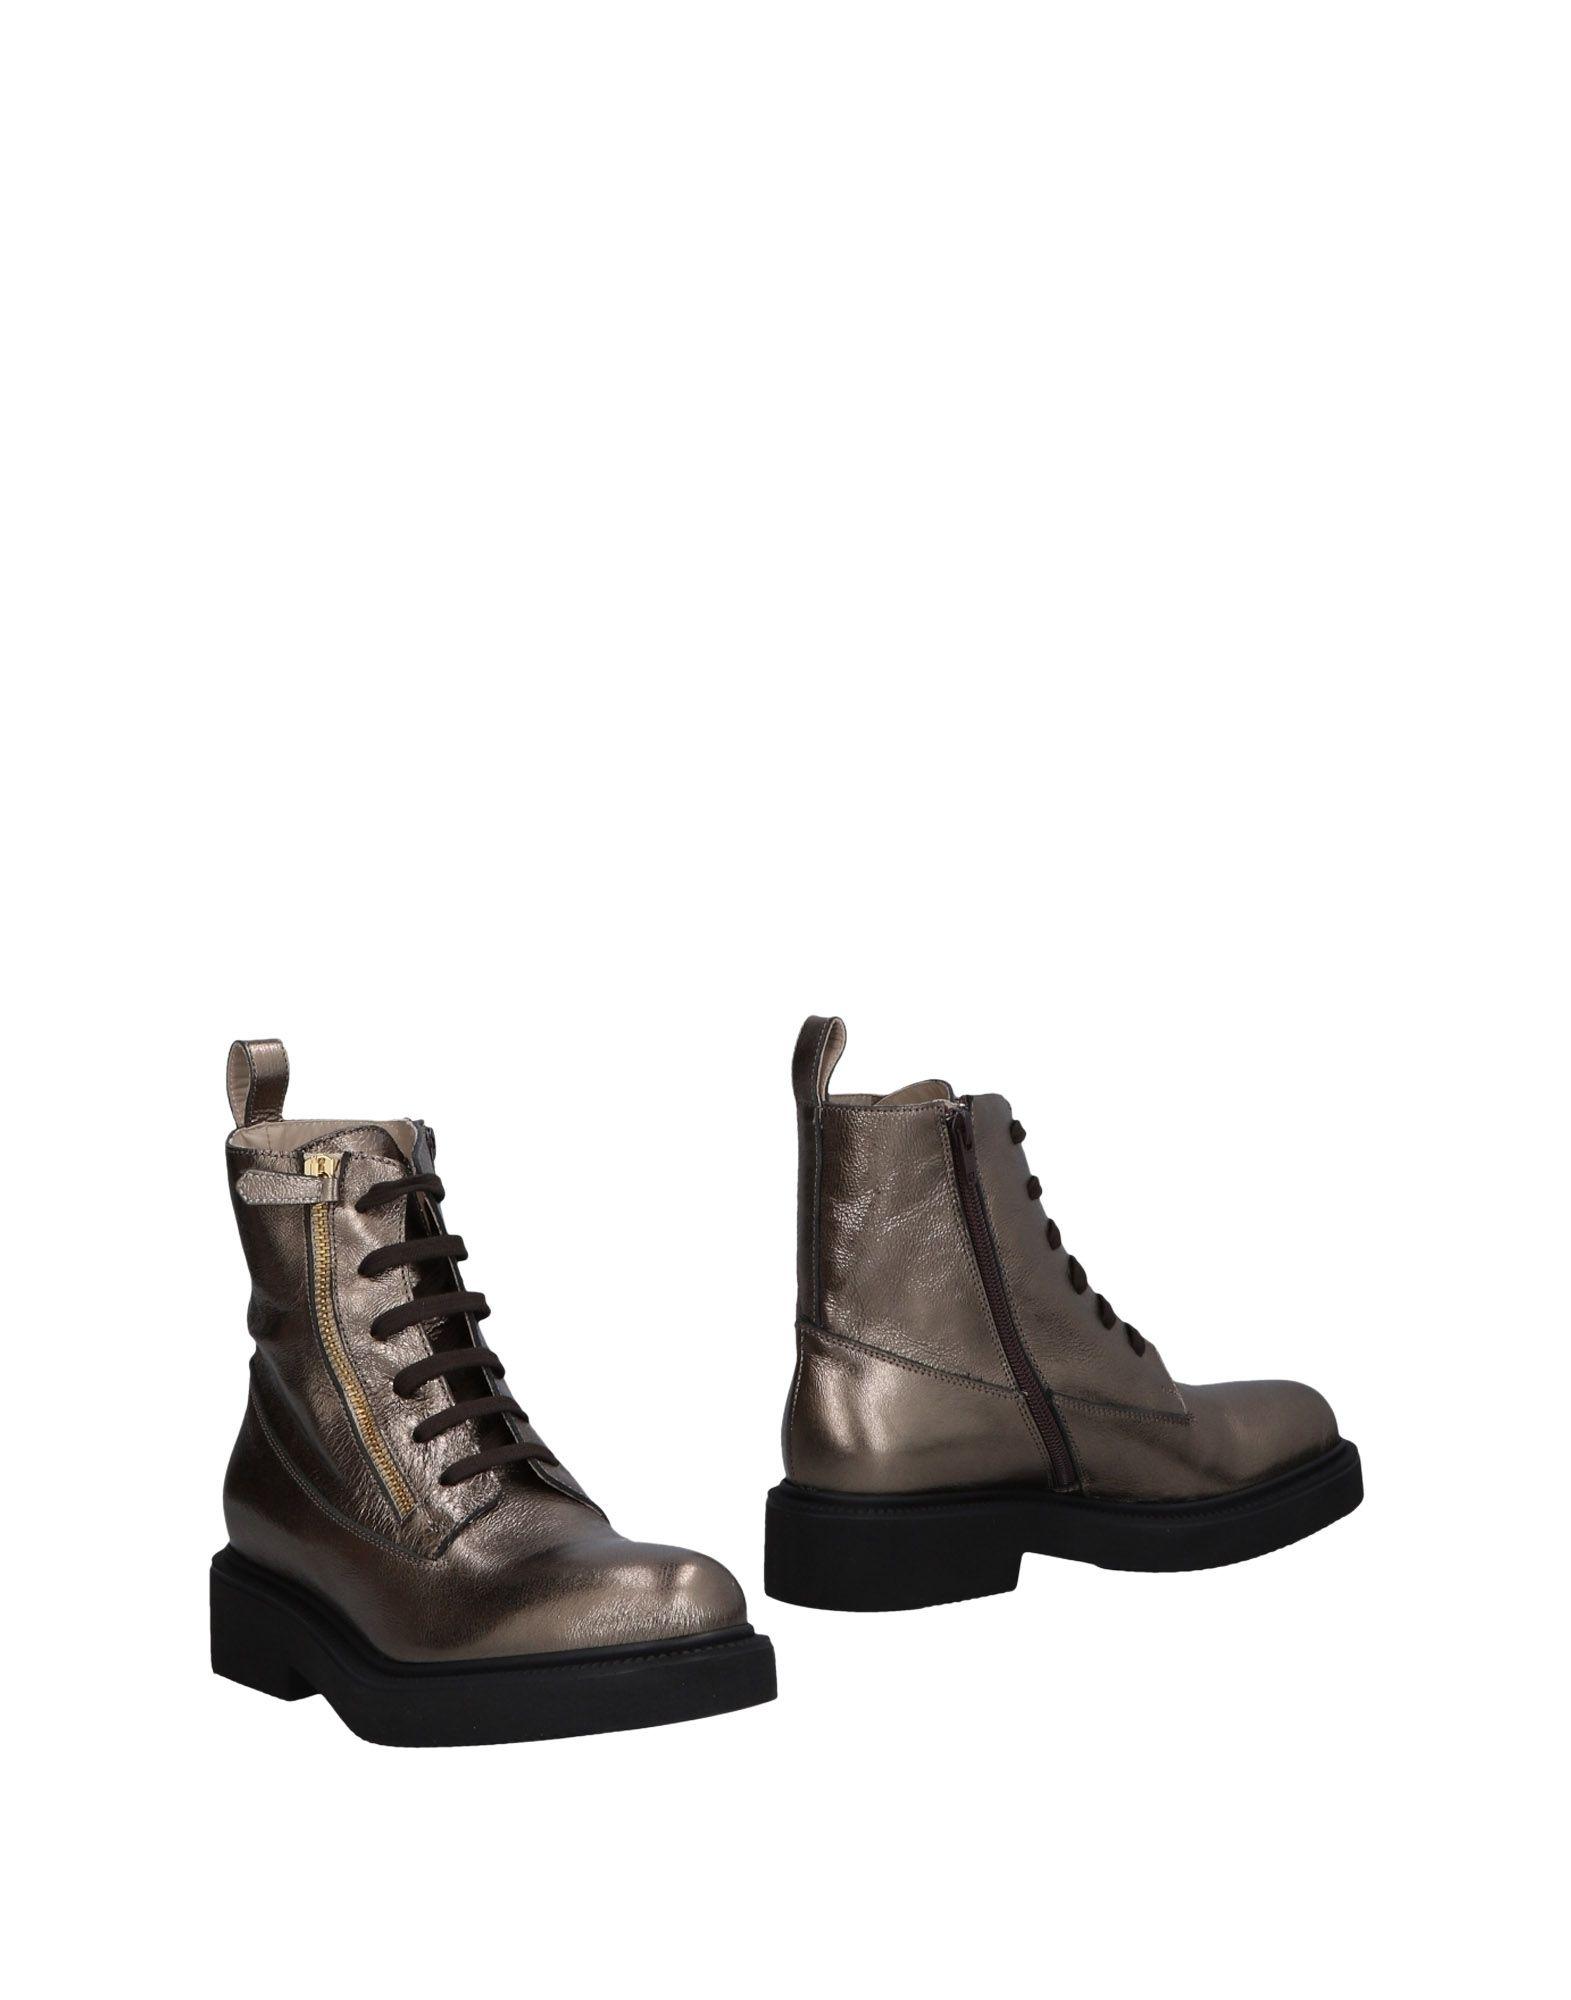 Sgn Giancarlo Paoli aussehende Stiefelette Damen  11479310OIGut aussehende Paoli strapazierfähige Schuhe 01cebf